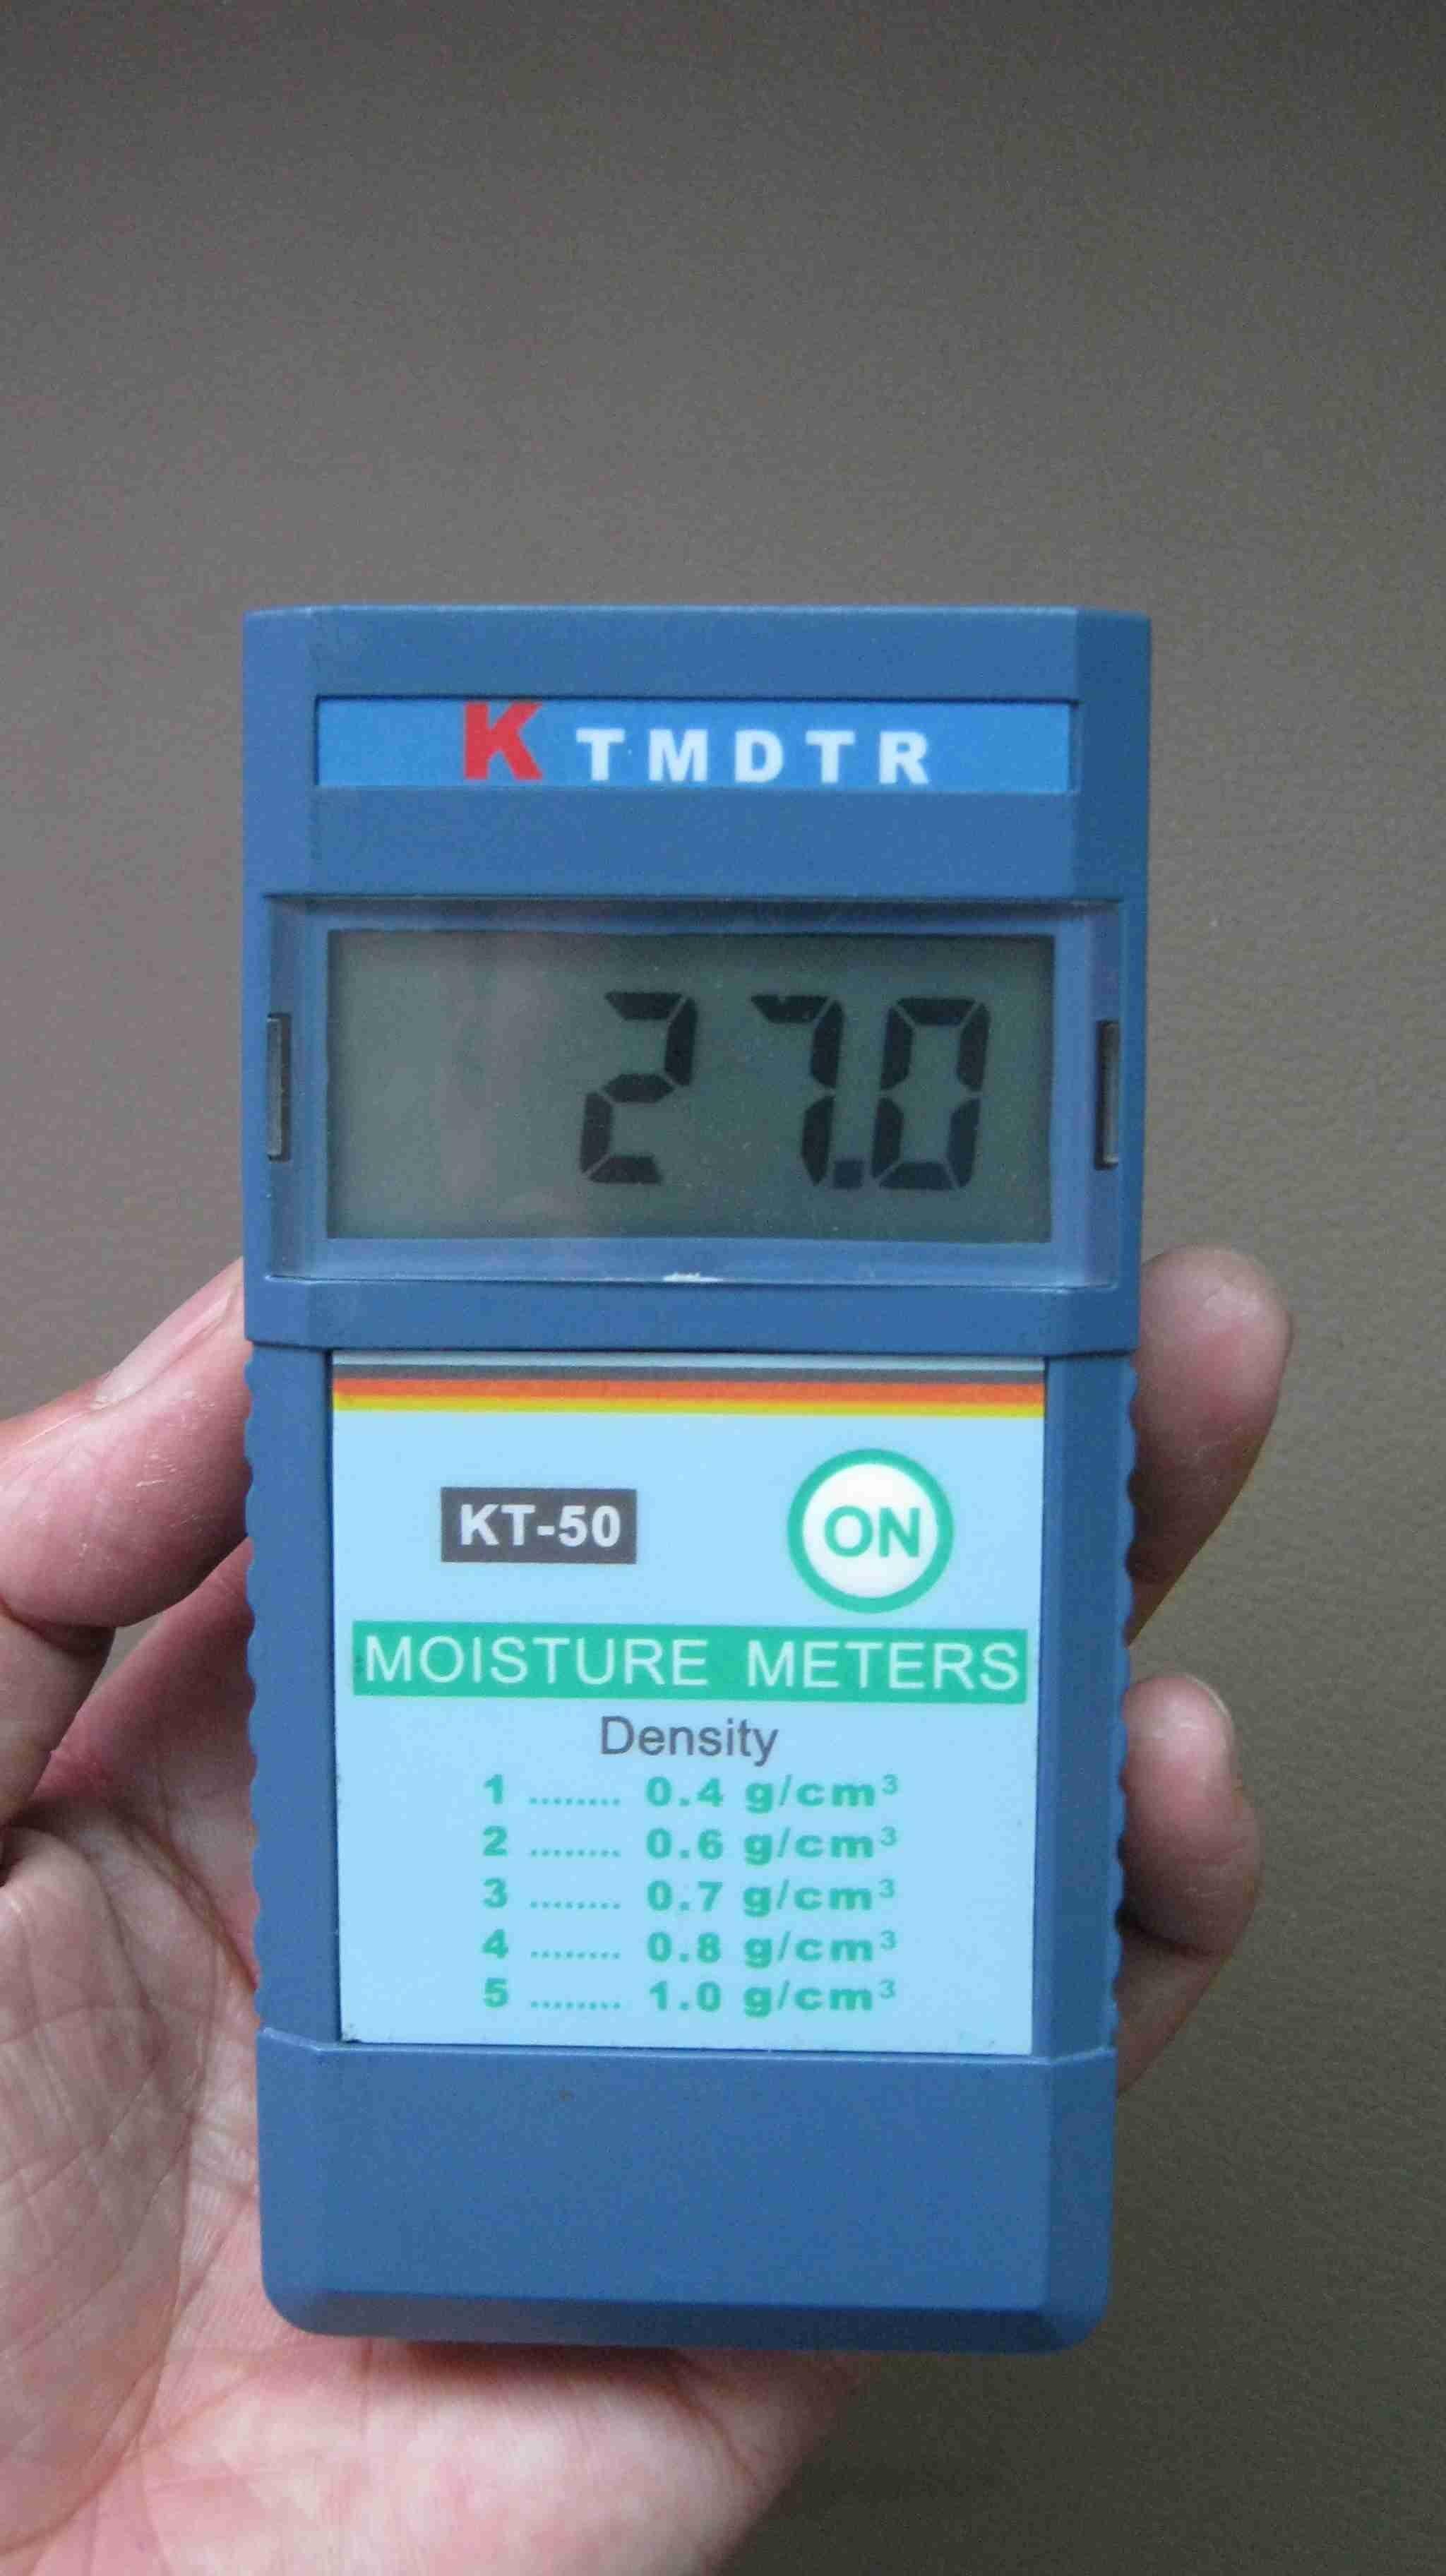 INDUCTIVE MOISTURE METER digital wood moisture meter KT-50B 2%~90% Resolution: 0.1% free shipping retali and wholesale  цены